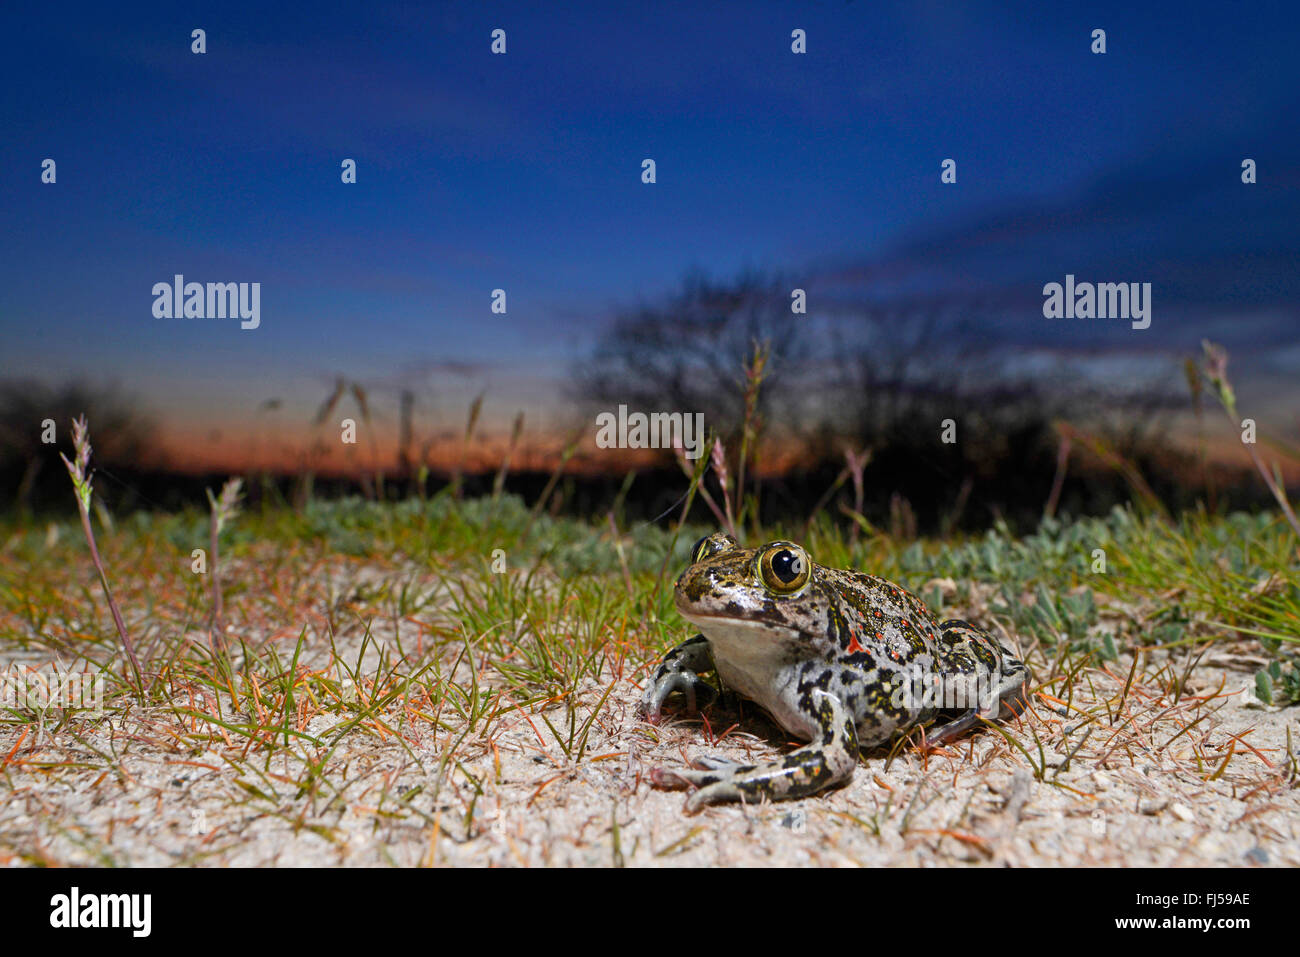 Eastern European spadefoot, Syrian spadefoot (Pelobates syriacus), Syrian spadefoot lurking for prey at sunset, Stock Photo